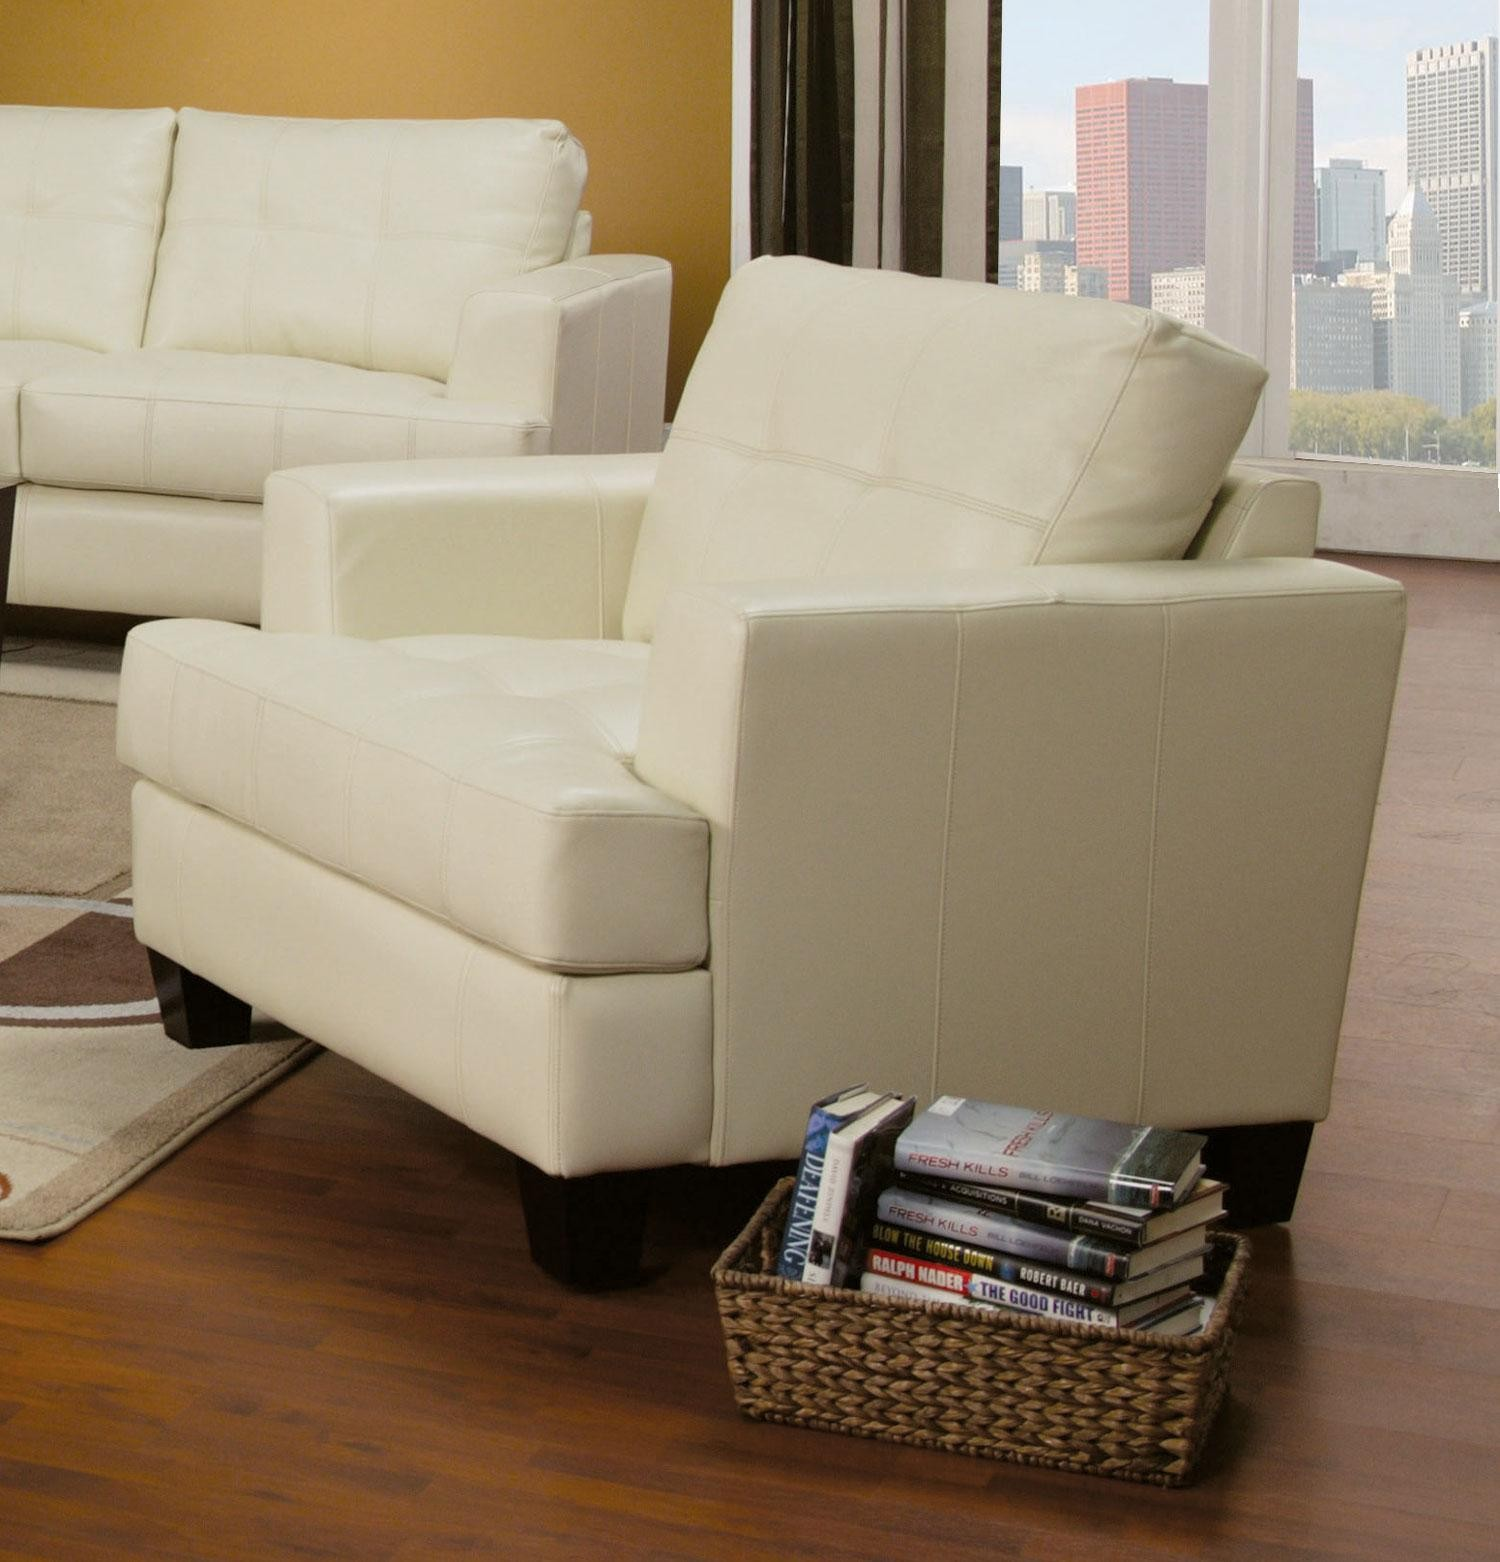 Samuel Cream Chair 501693 From Coaster 501693 Coleman Furniture